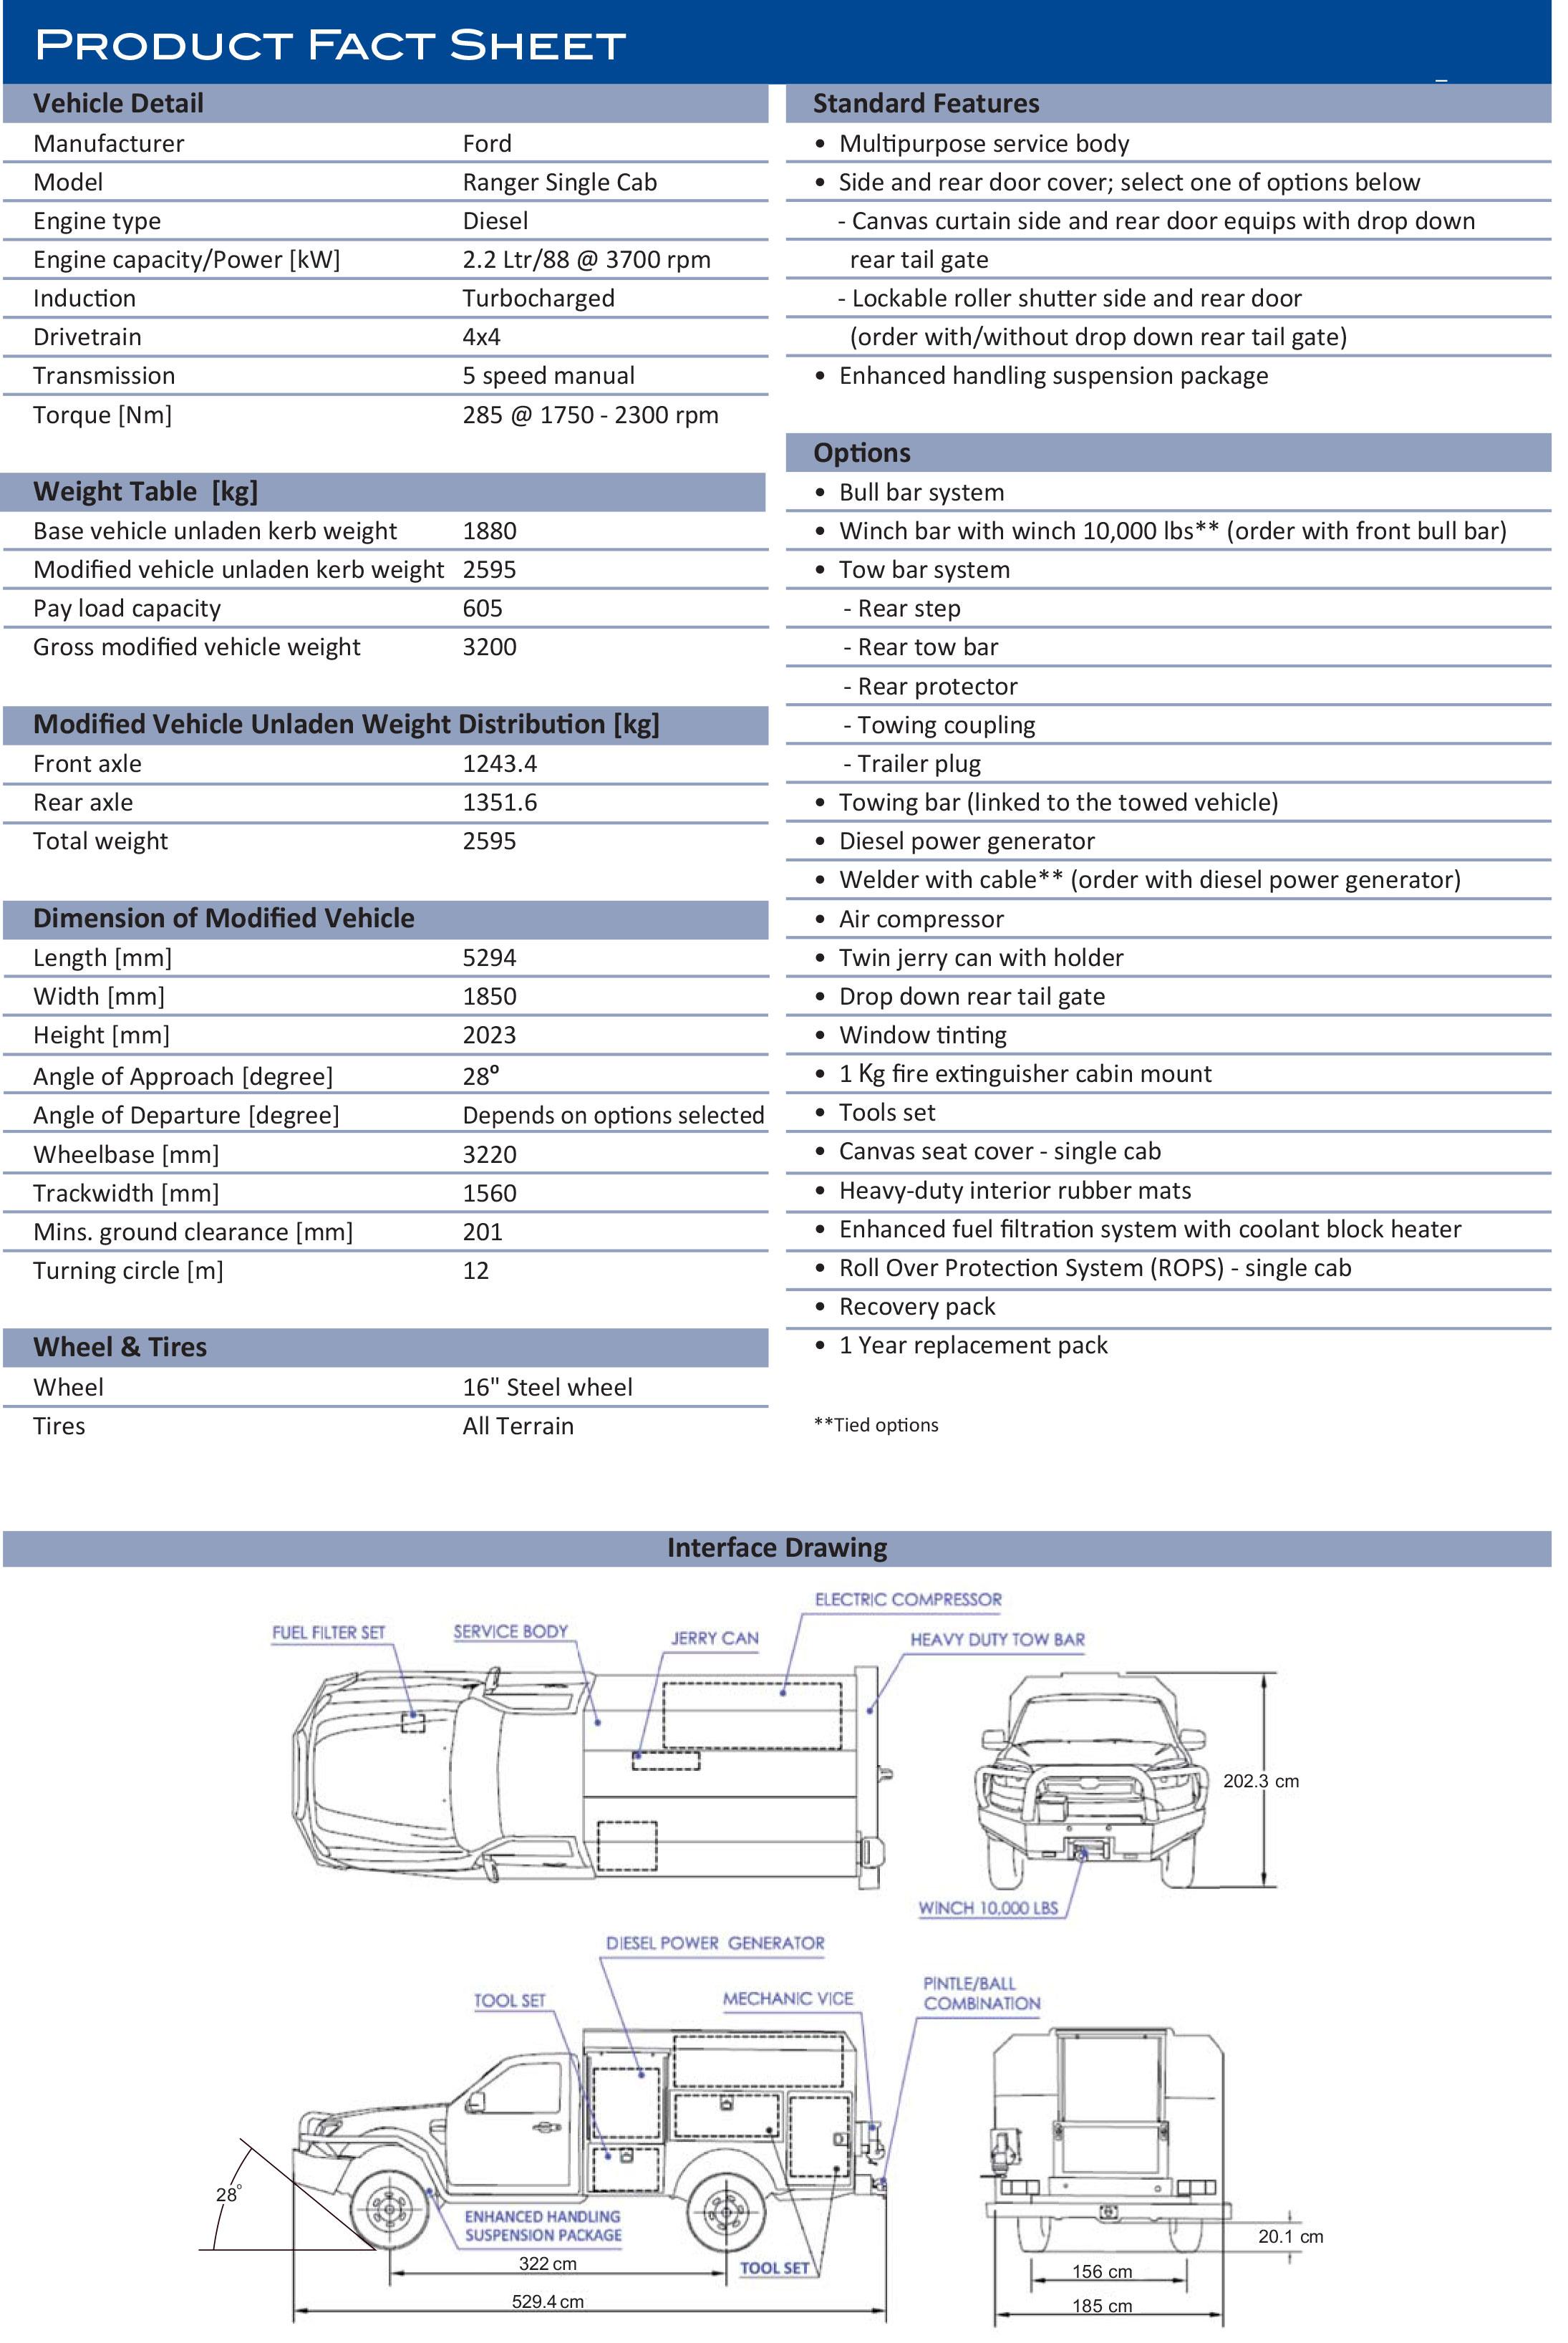 ford-maintenance-vihicle-2